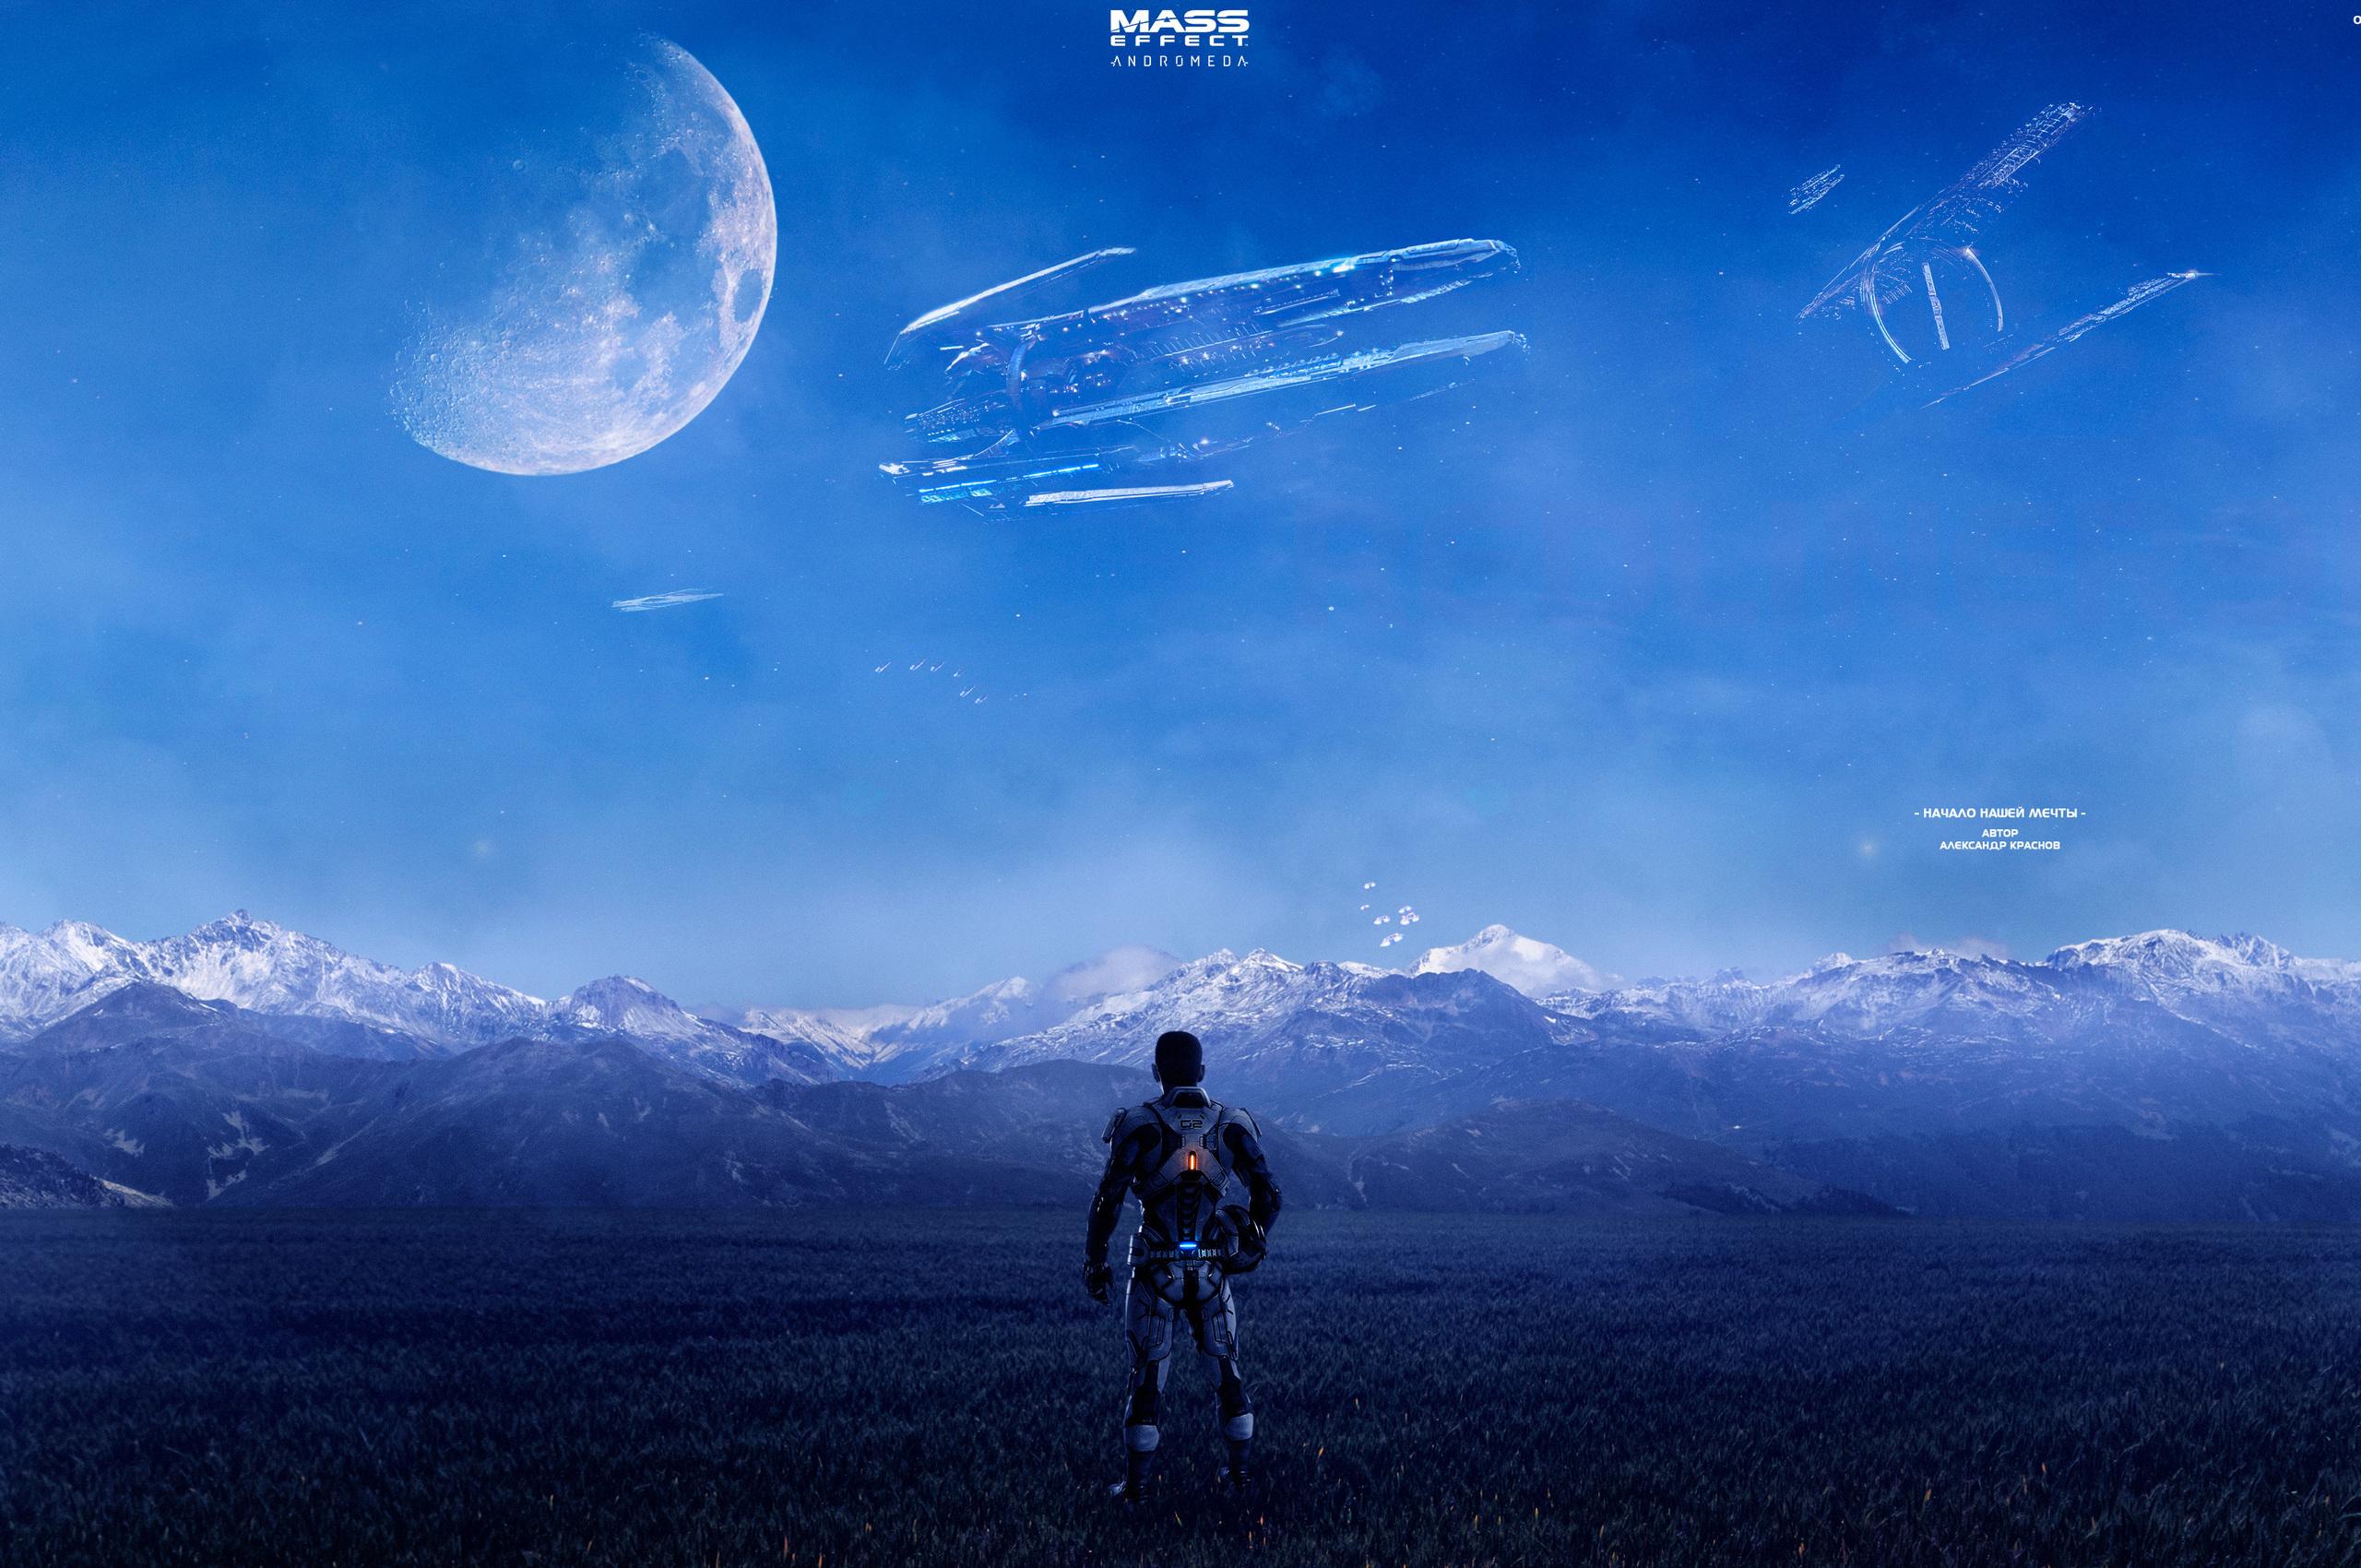 2560x1700 Mass Effect Andromeda Game Artwork Chromebook